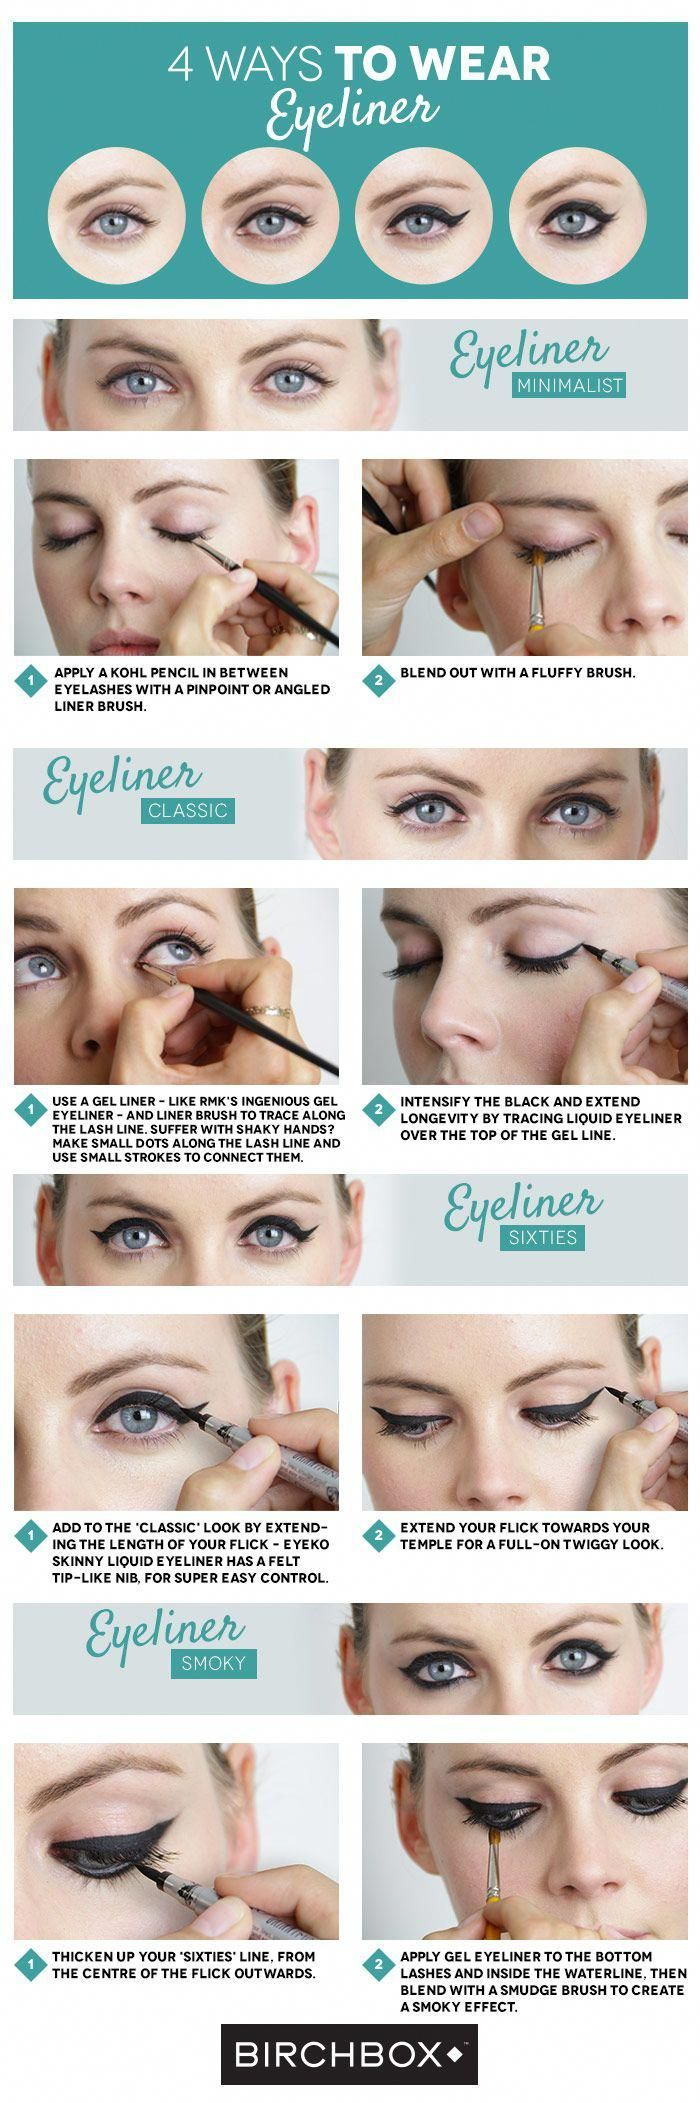 Best Liquid Eyeliner | Glitter Eyeshadow Pencil | Good Gel Liner 20190830 #goodeyeliner Best Liquid Eyeliner | Glitter Eyeshadow Pencil | Good Gel Liner 20190830 #goodeyeliner